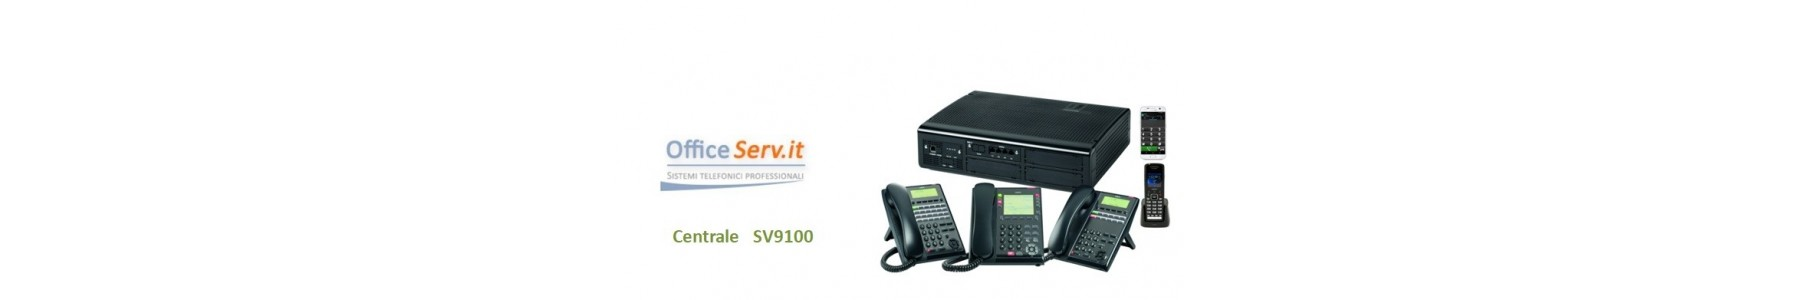 CENTRALE SV9100